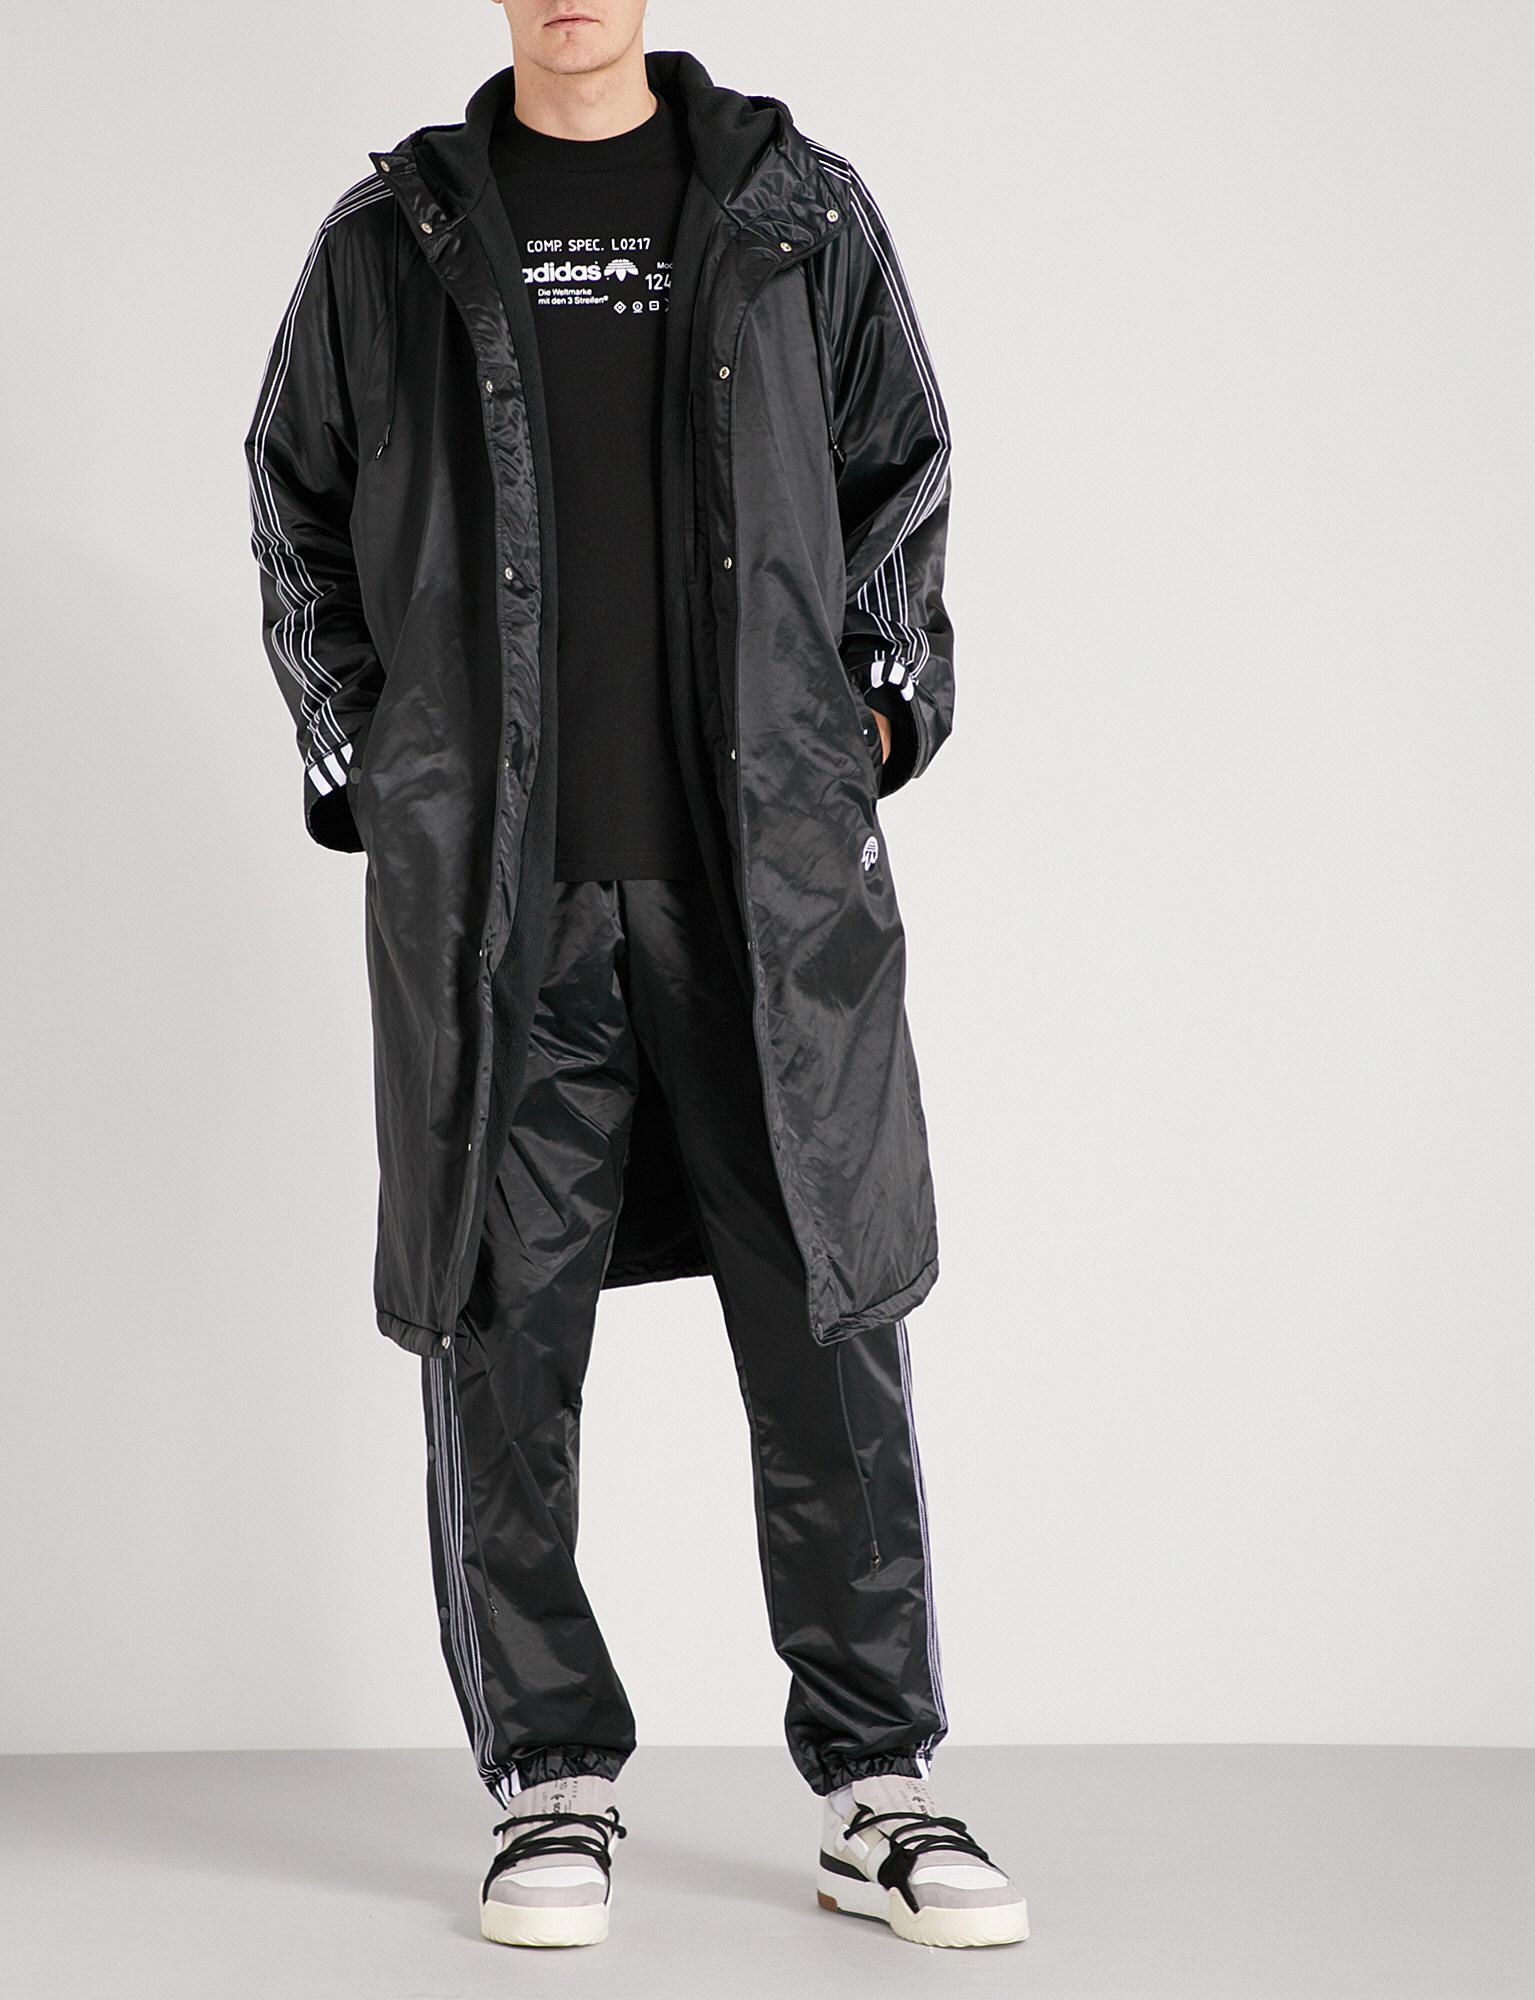 6abdfdce20d6 Lyst - Alexander Wang Stadium Shell Jacket in Black for Men